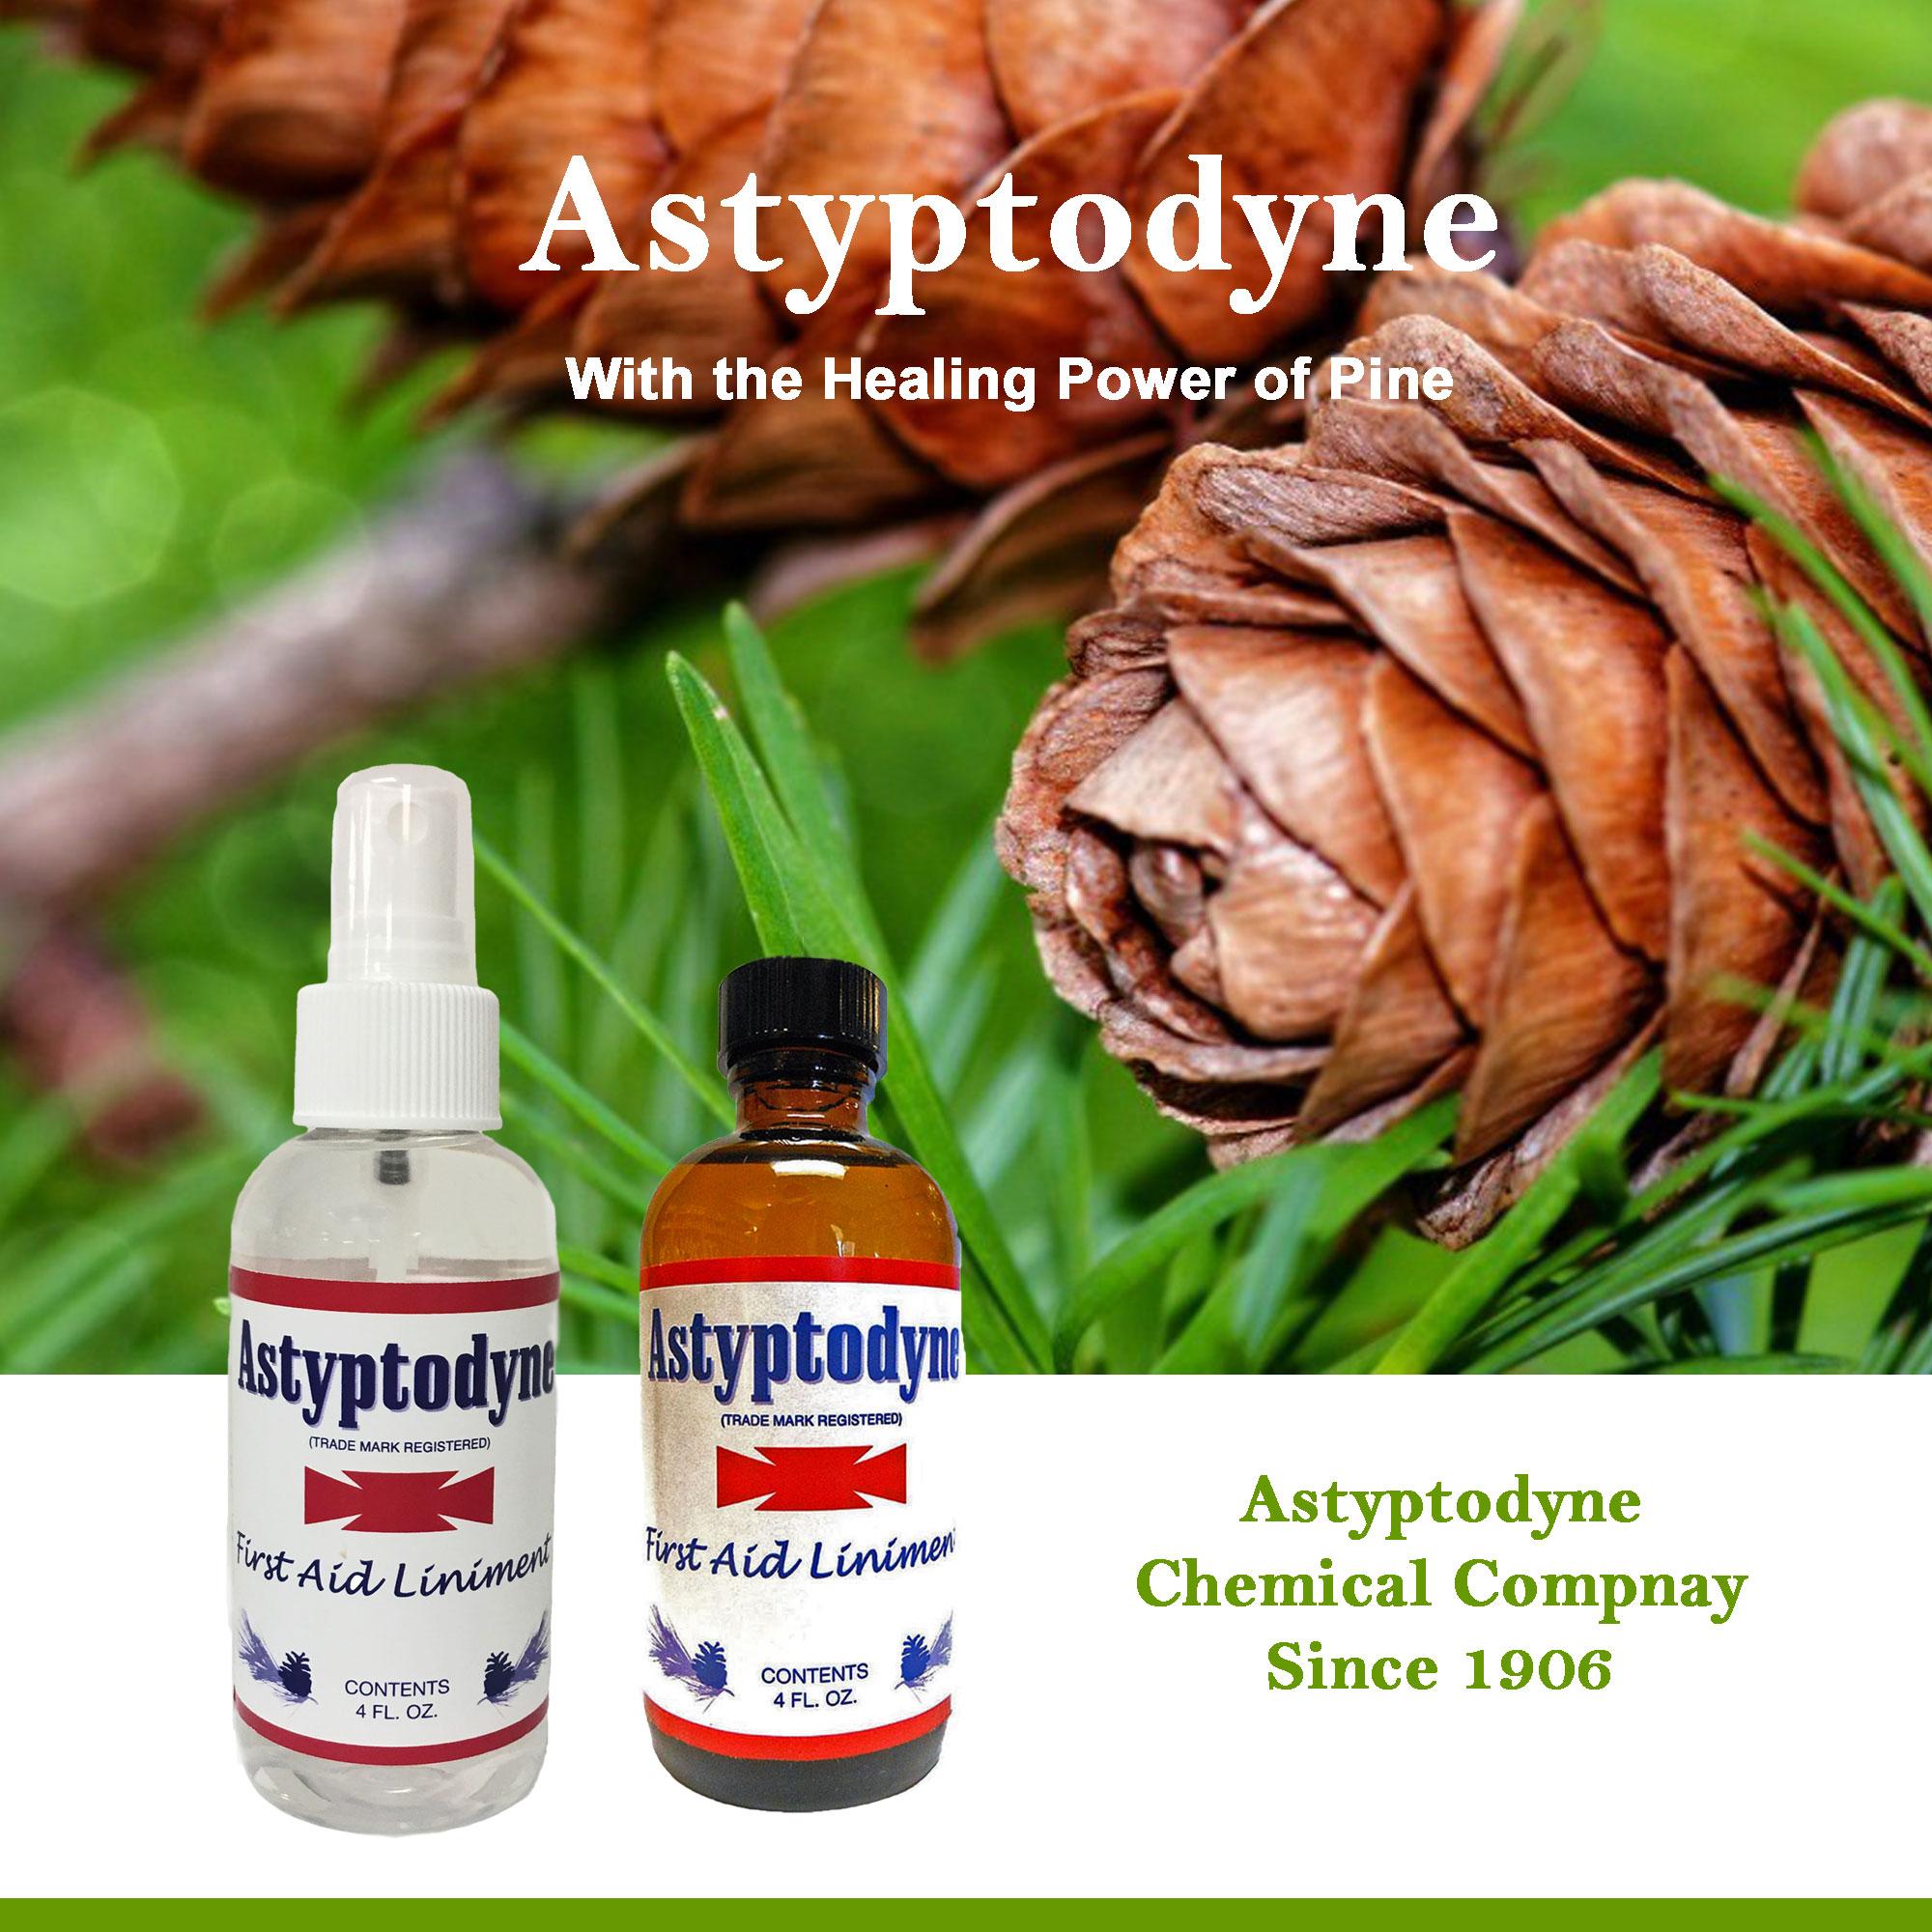 Astyptodyne Chemical Co